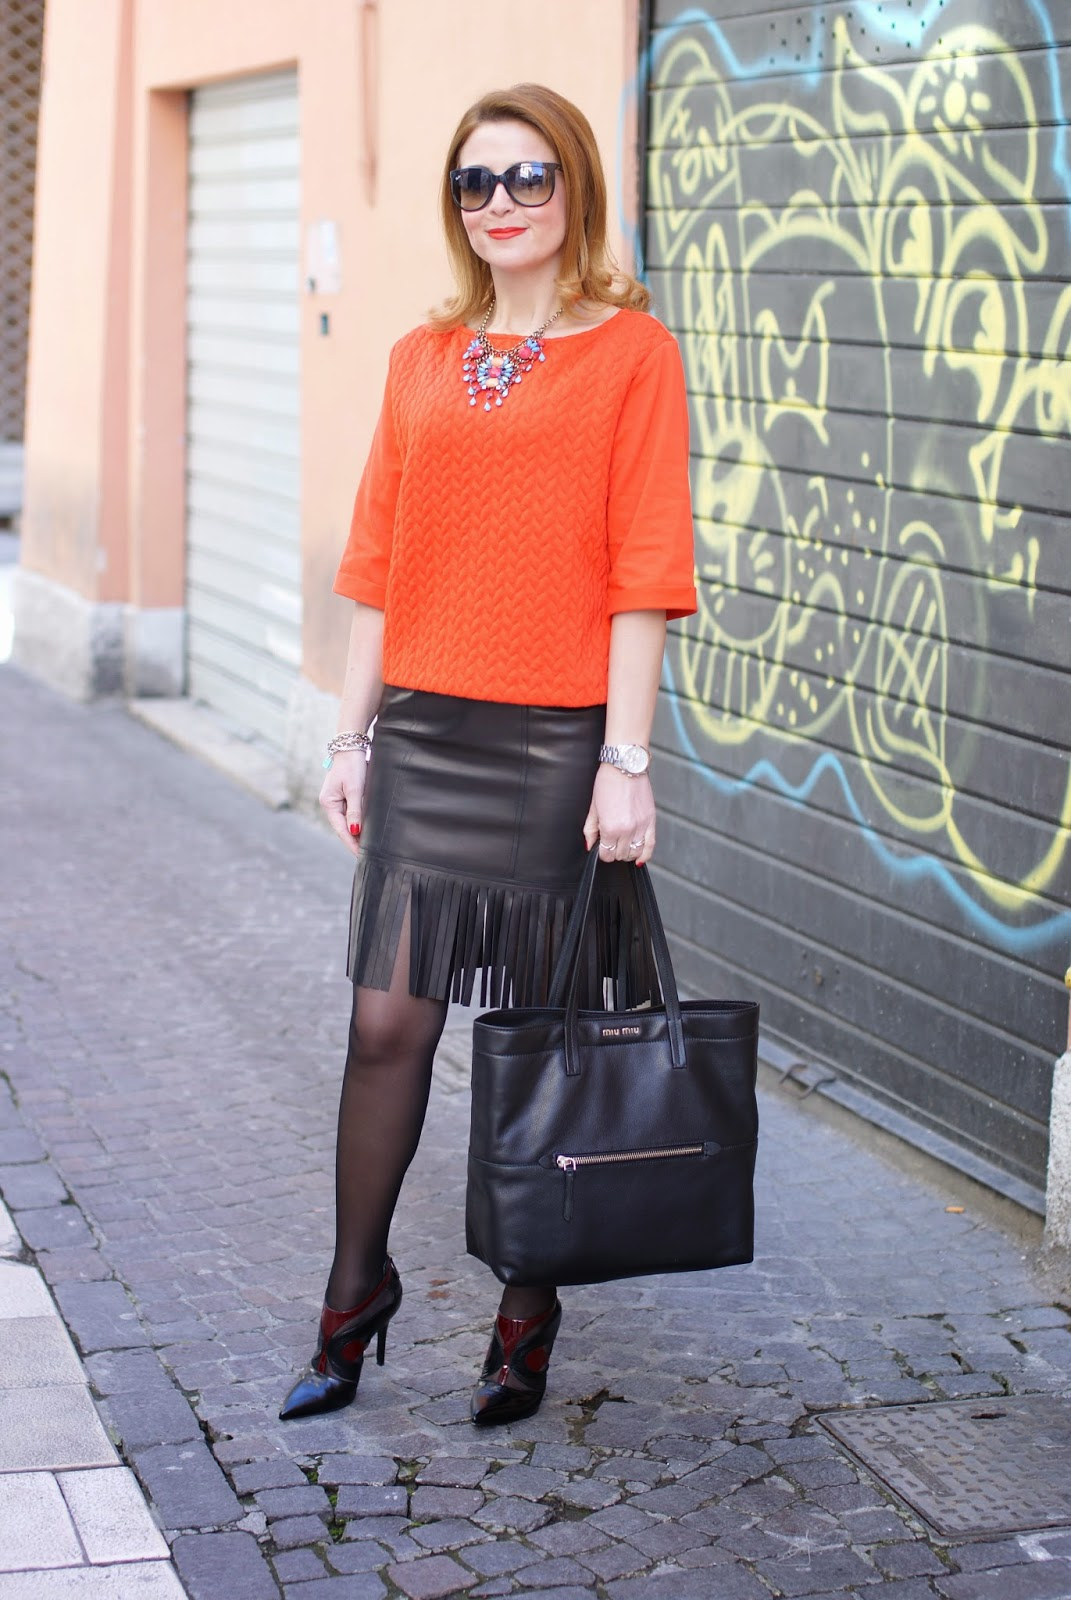 Blumarine leather fringed skirt, fringe hemline skirt, black sheer tights, Miu Miu black tote, bijou brigitte necklace, Fashion and Cookies fashion blog, fashion blogger